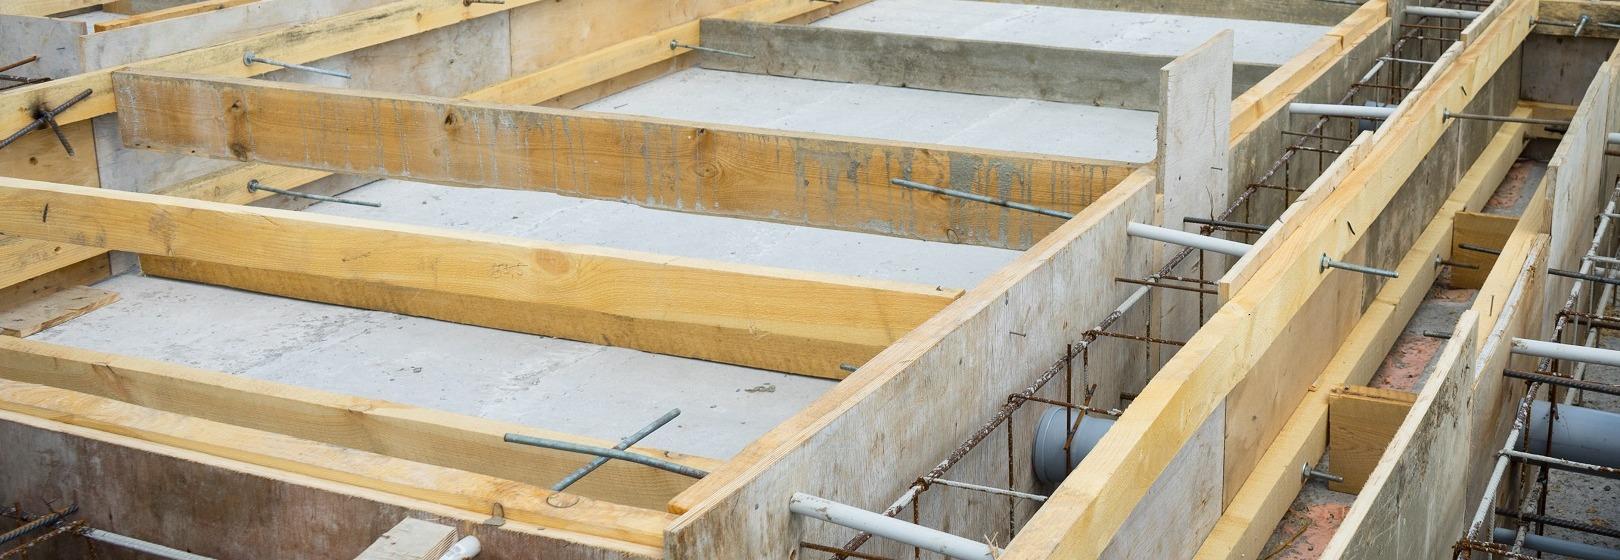 fundamenty pod dom